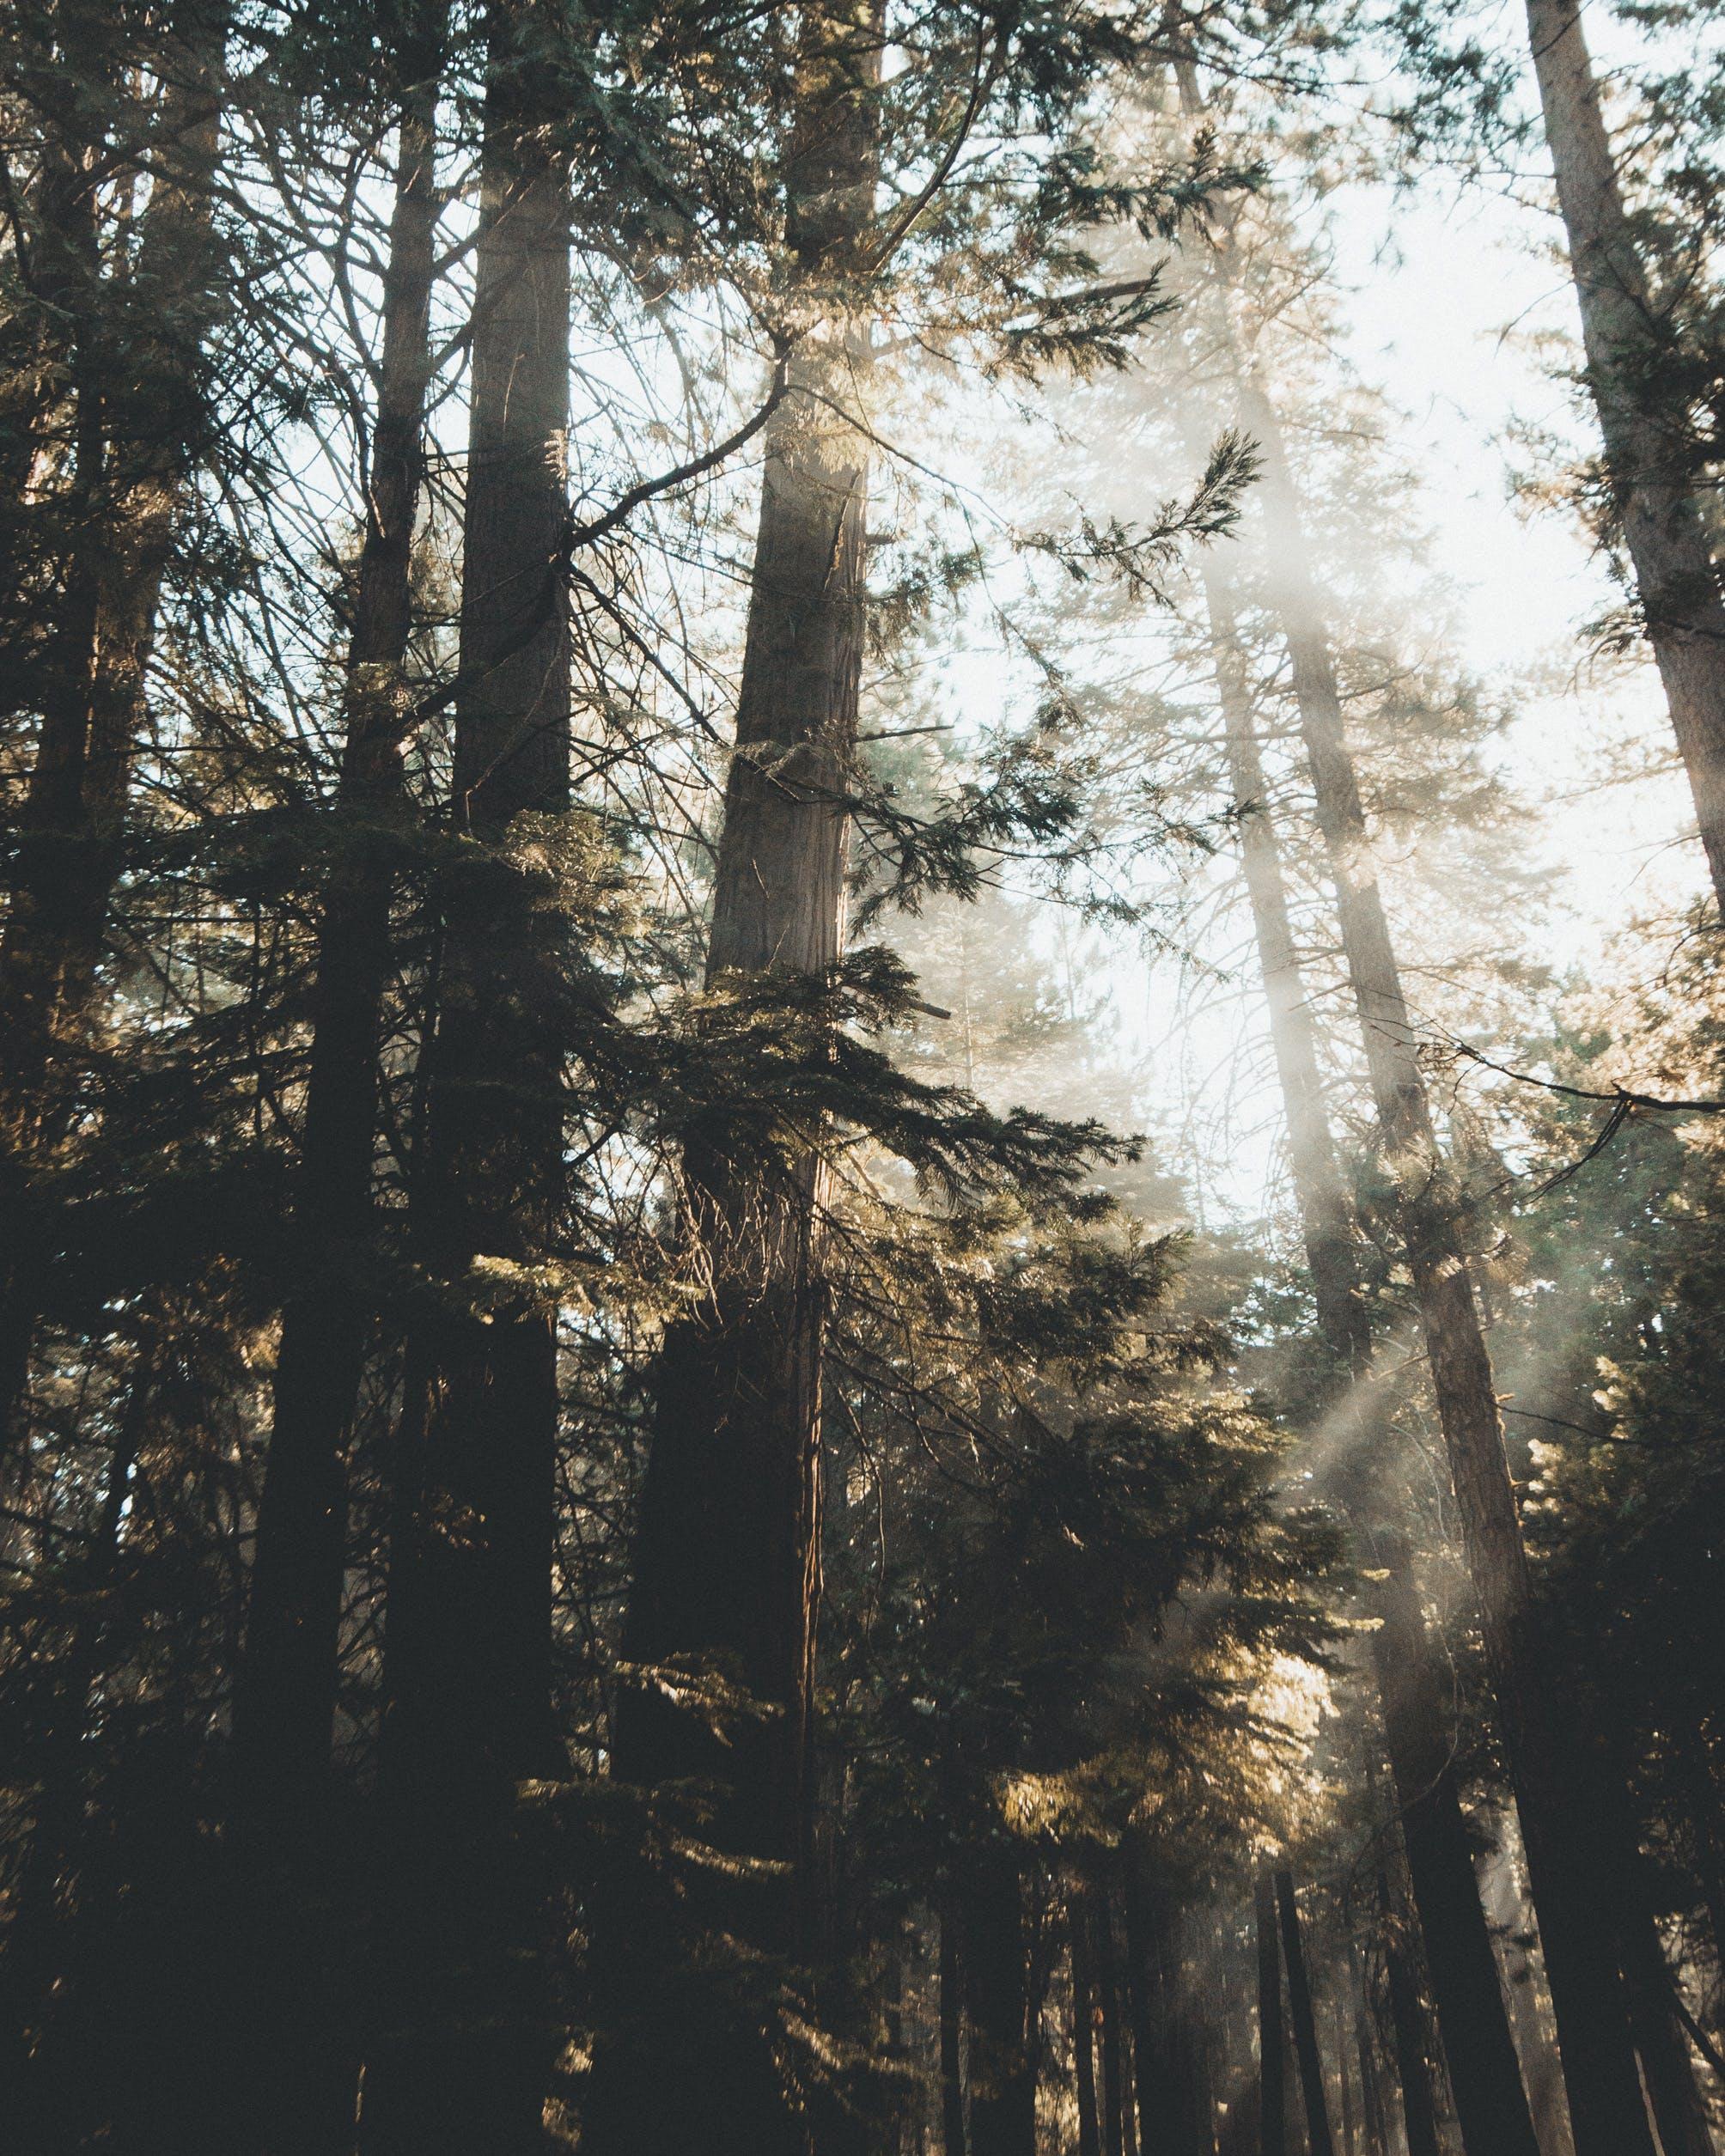 Pine Tree and Sun Light